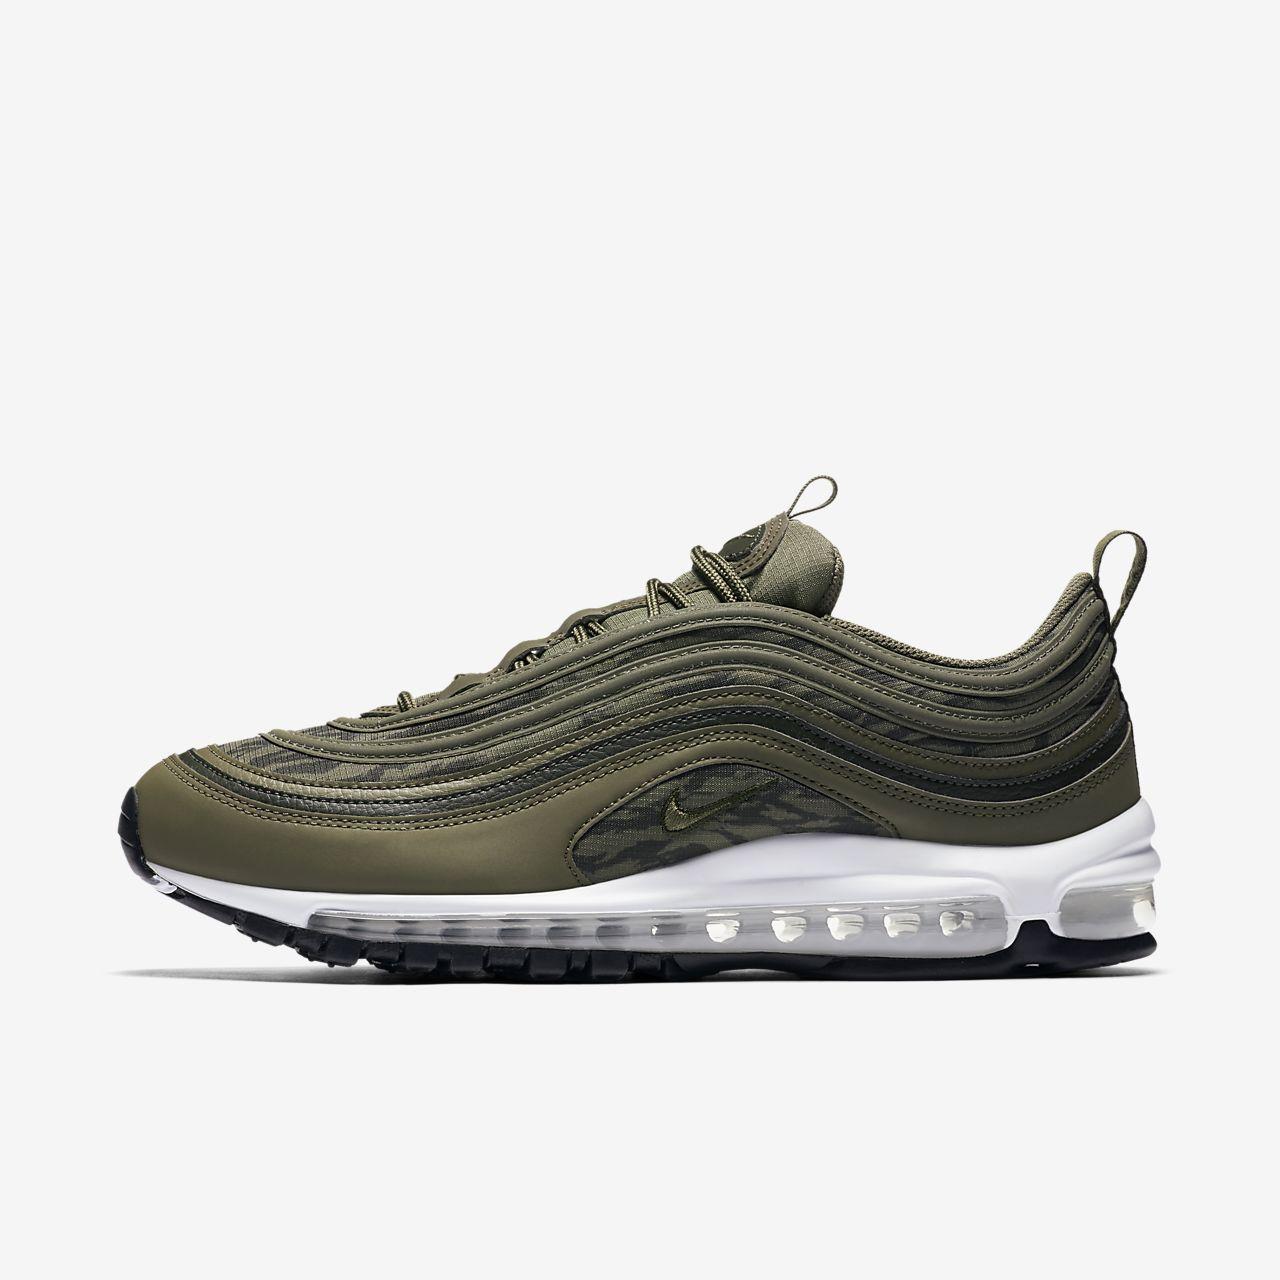 Nike Air Max 97 Medium oliv Sequoia schwarzes Herren Turnschuhe Alle Gr en